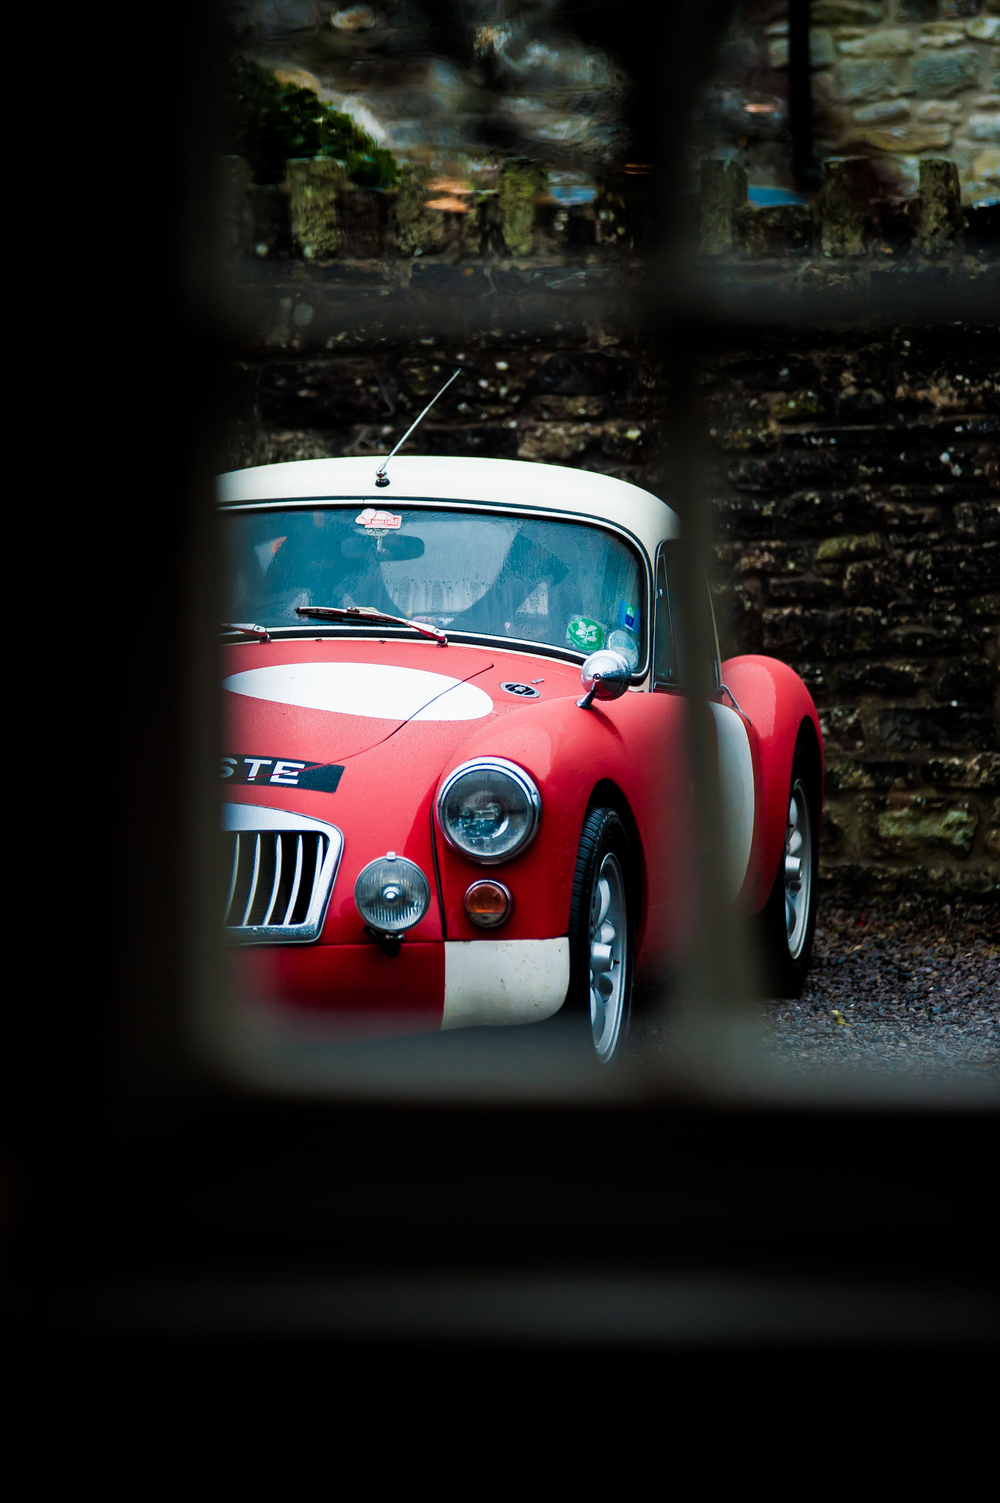 rally-MGA-hi-res-34.jpg